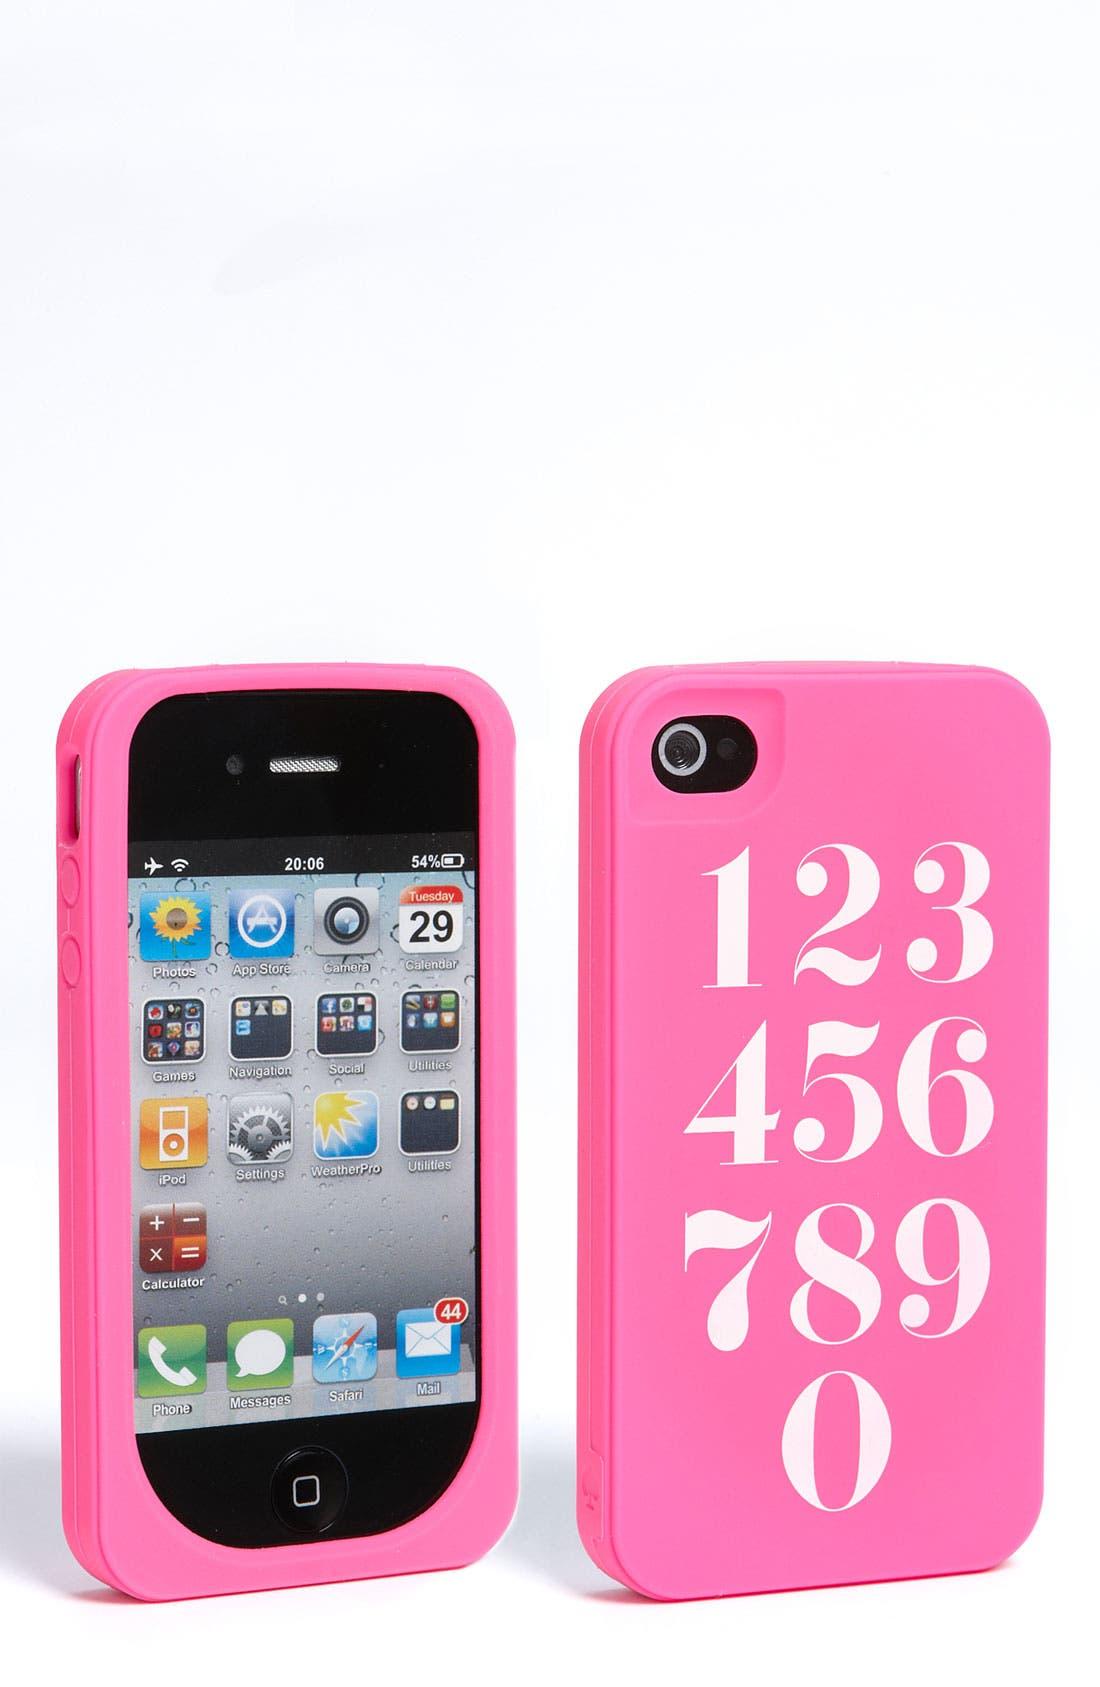 Main Image - kate spade new york 'call me crazy' iPhone 4 & 4S case